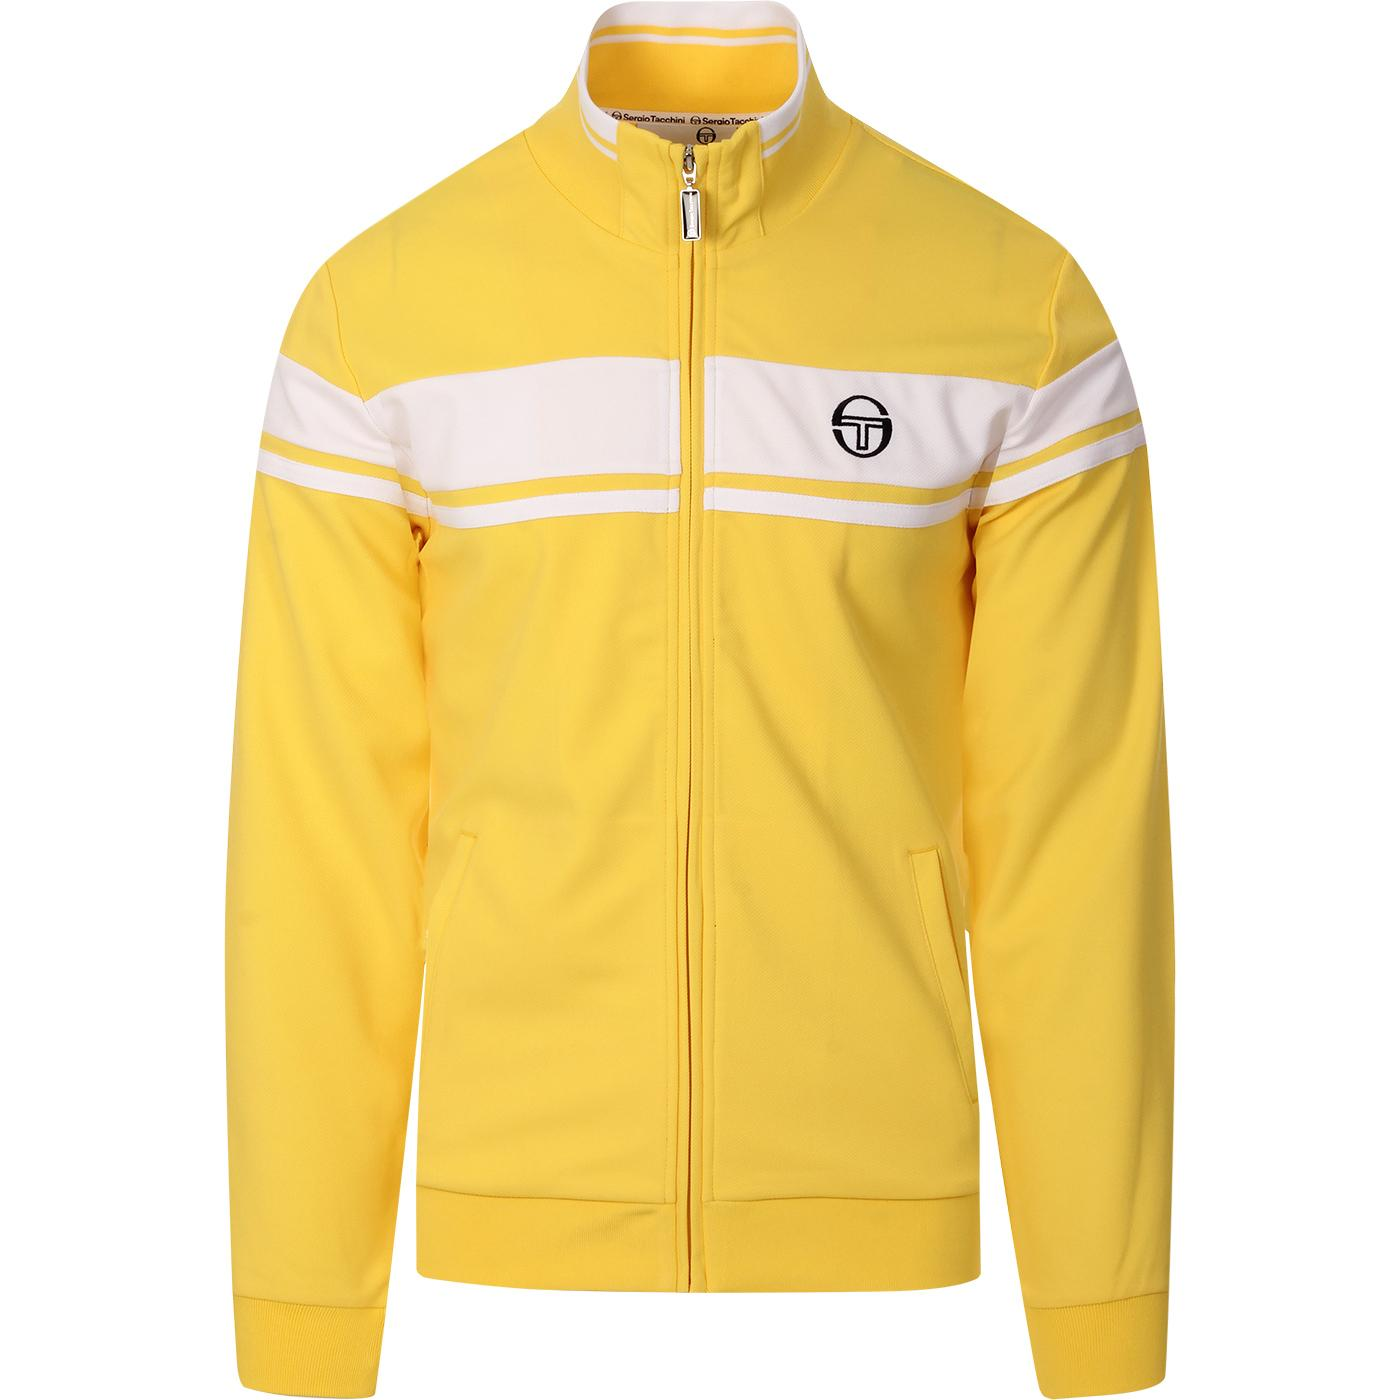 Damarindo SERGIO TACCHINI Retro Track Jacket (G)